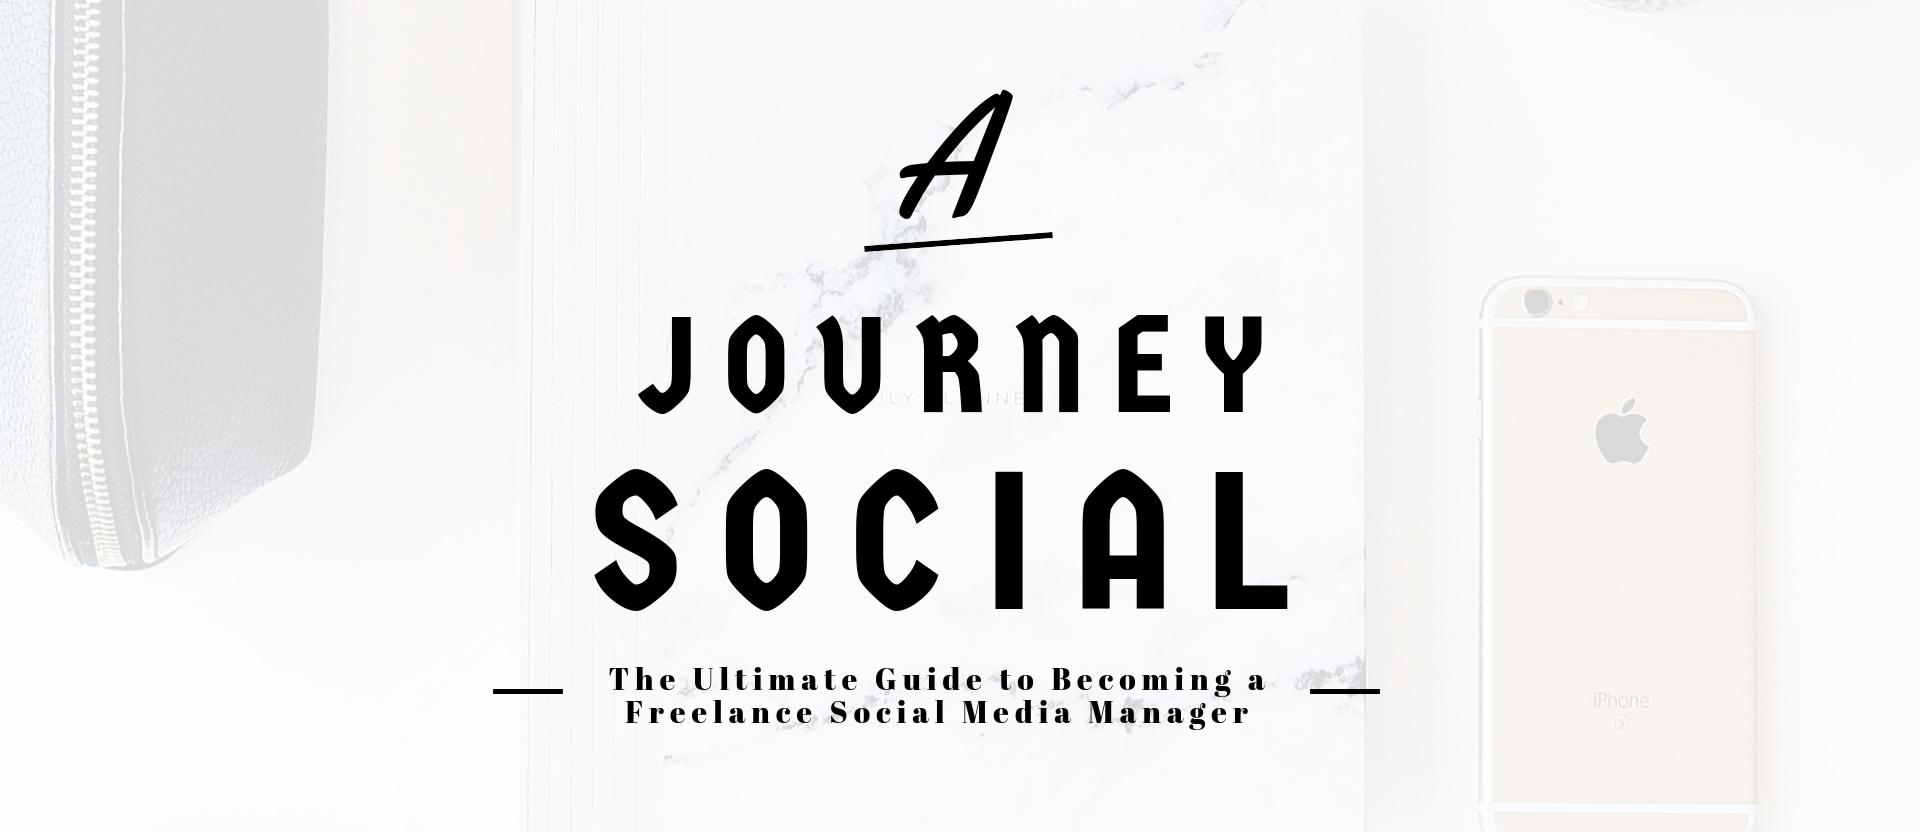 A Journey Social (1%2F2).jpg